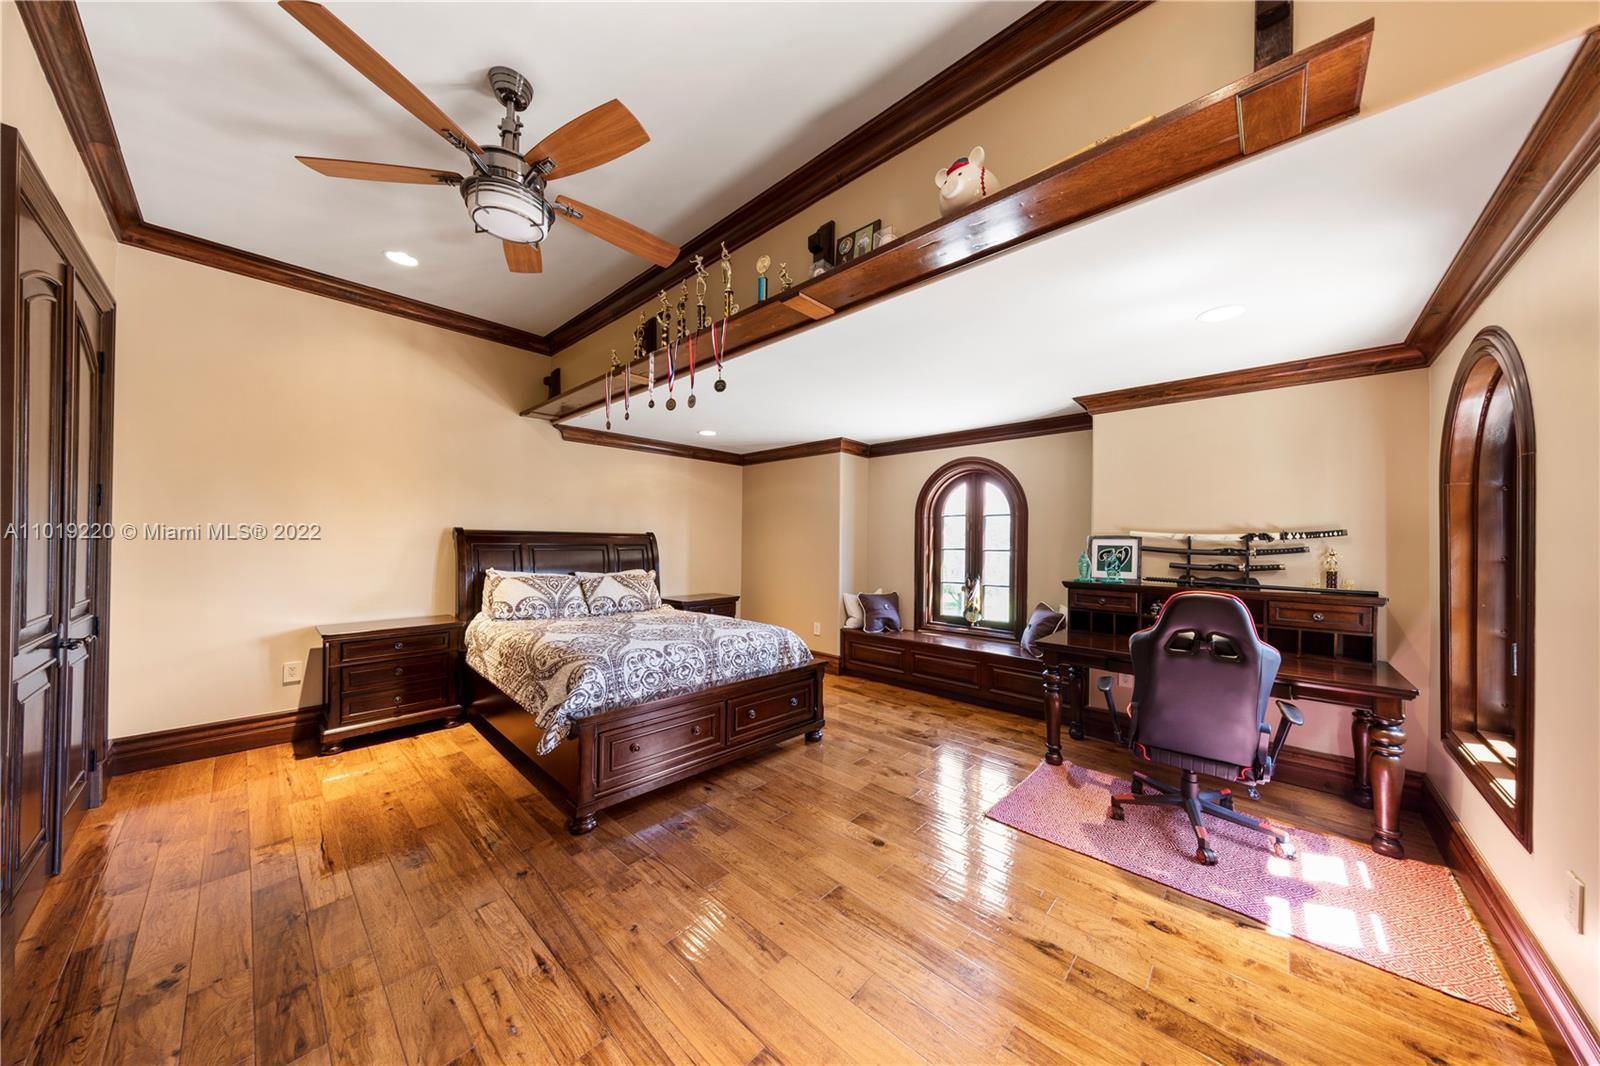 17201 Sw 248th St Property Photo 43